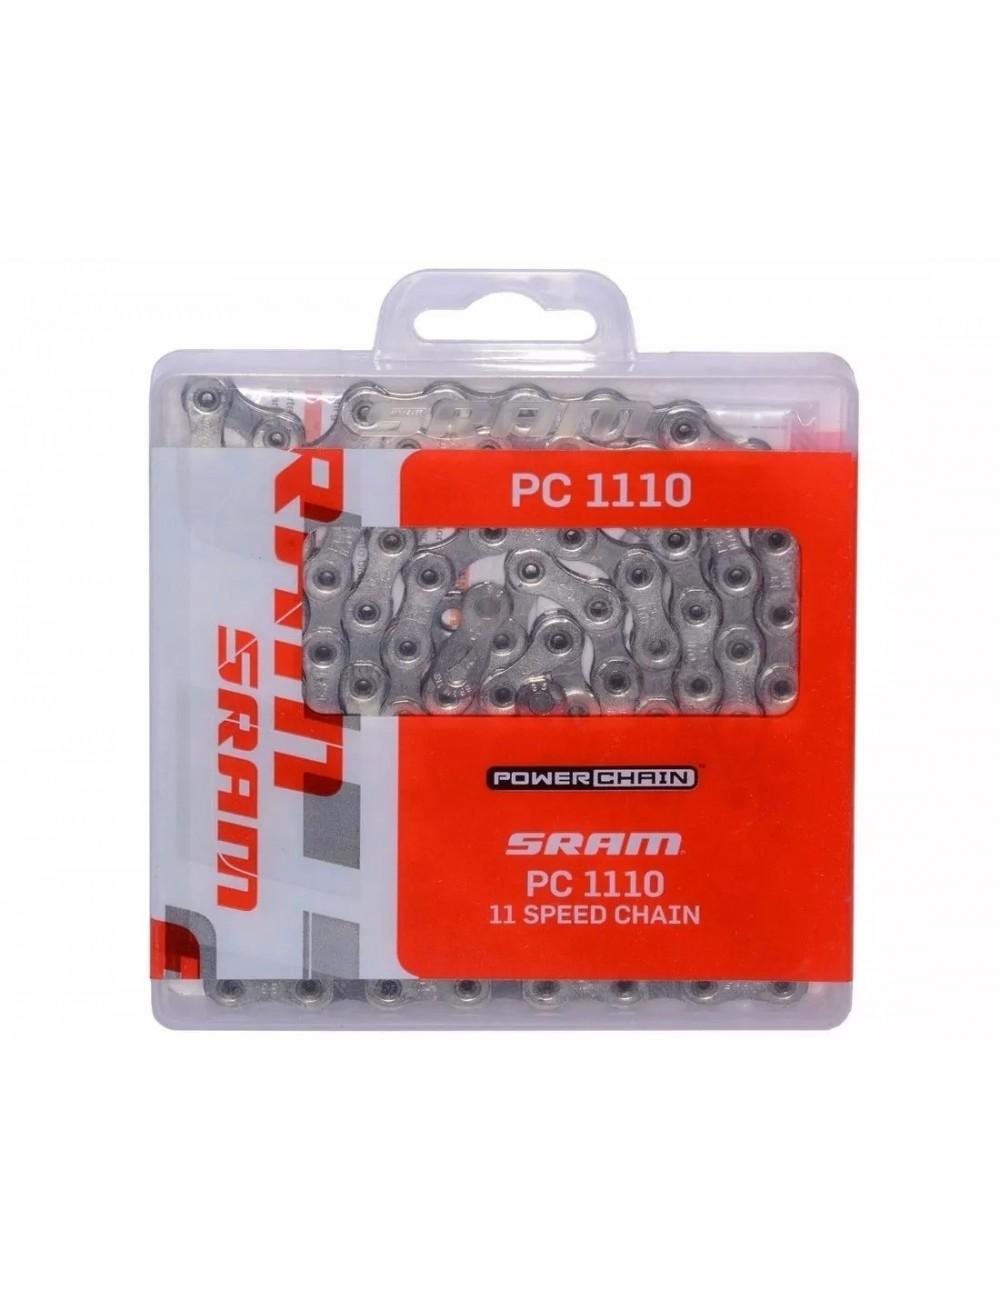 CORRENTE SRAM PC 1110 114 ELOS POWERLOCK 11V   2017